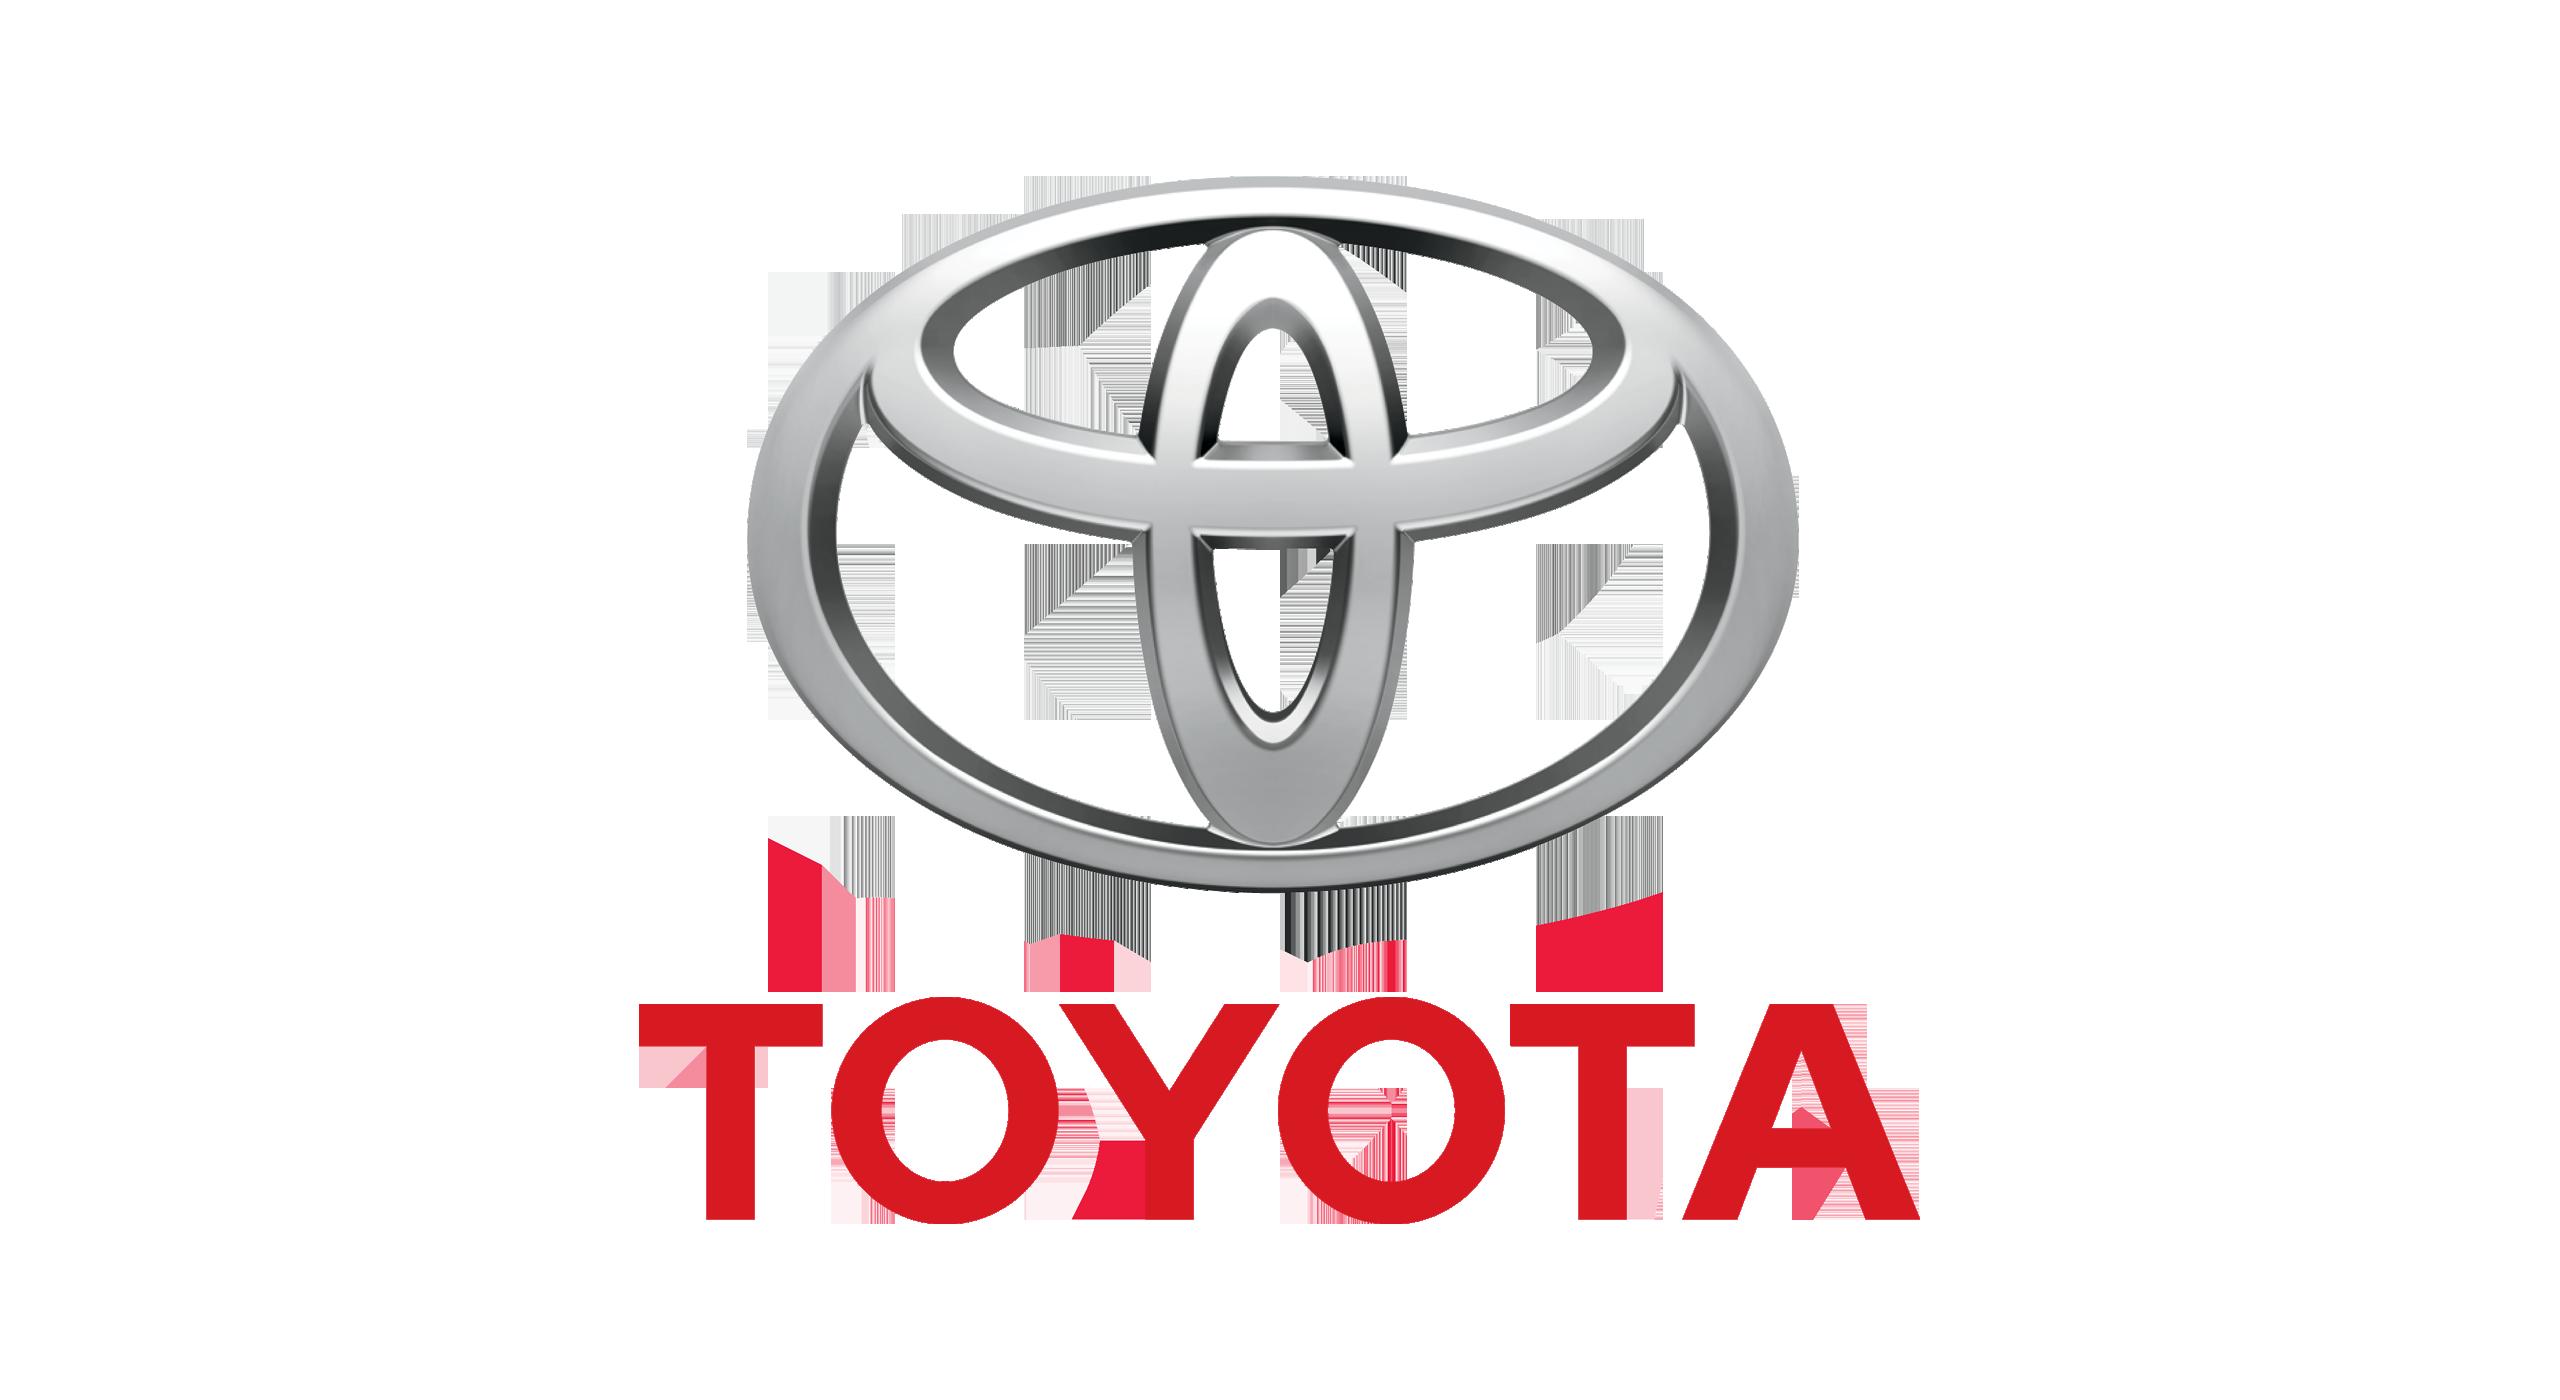 Toyota Logo (1989-Present) 2560x1440 HD png - Toyota HD PNG